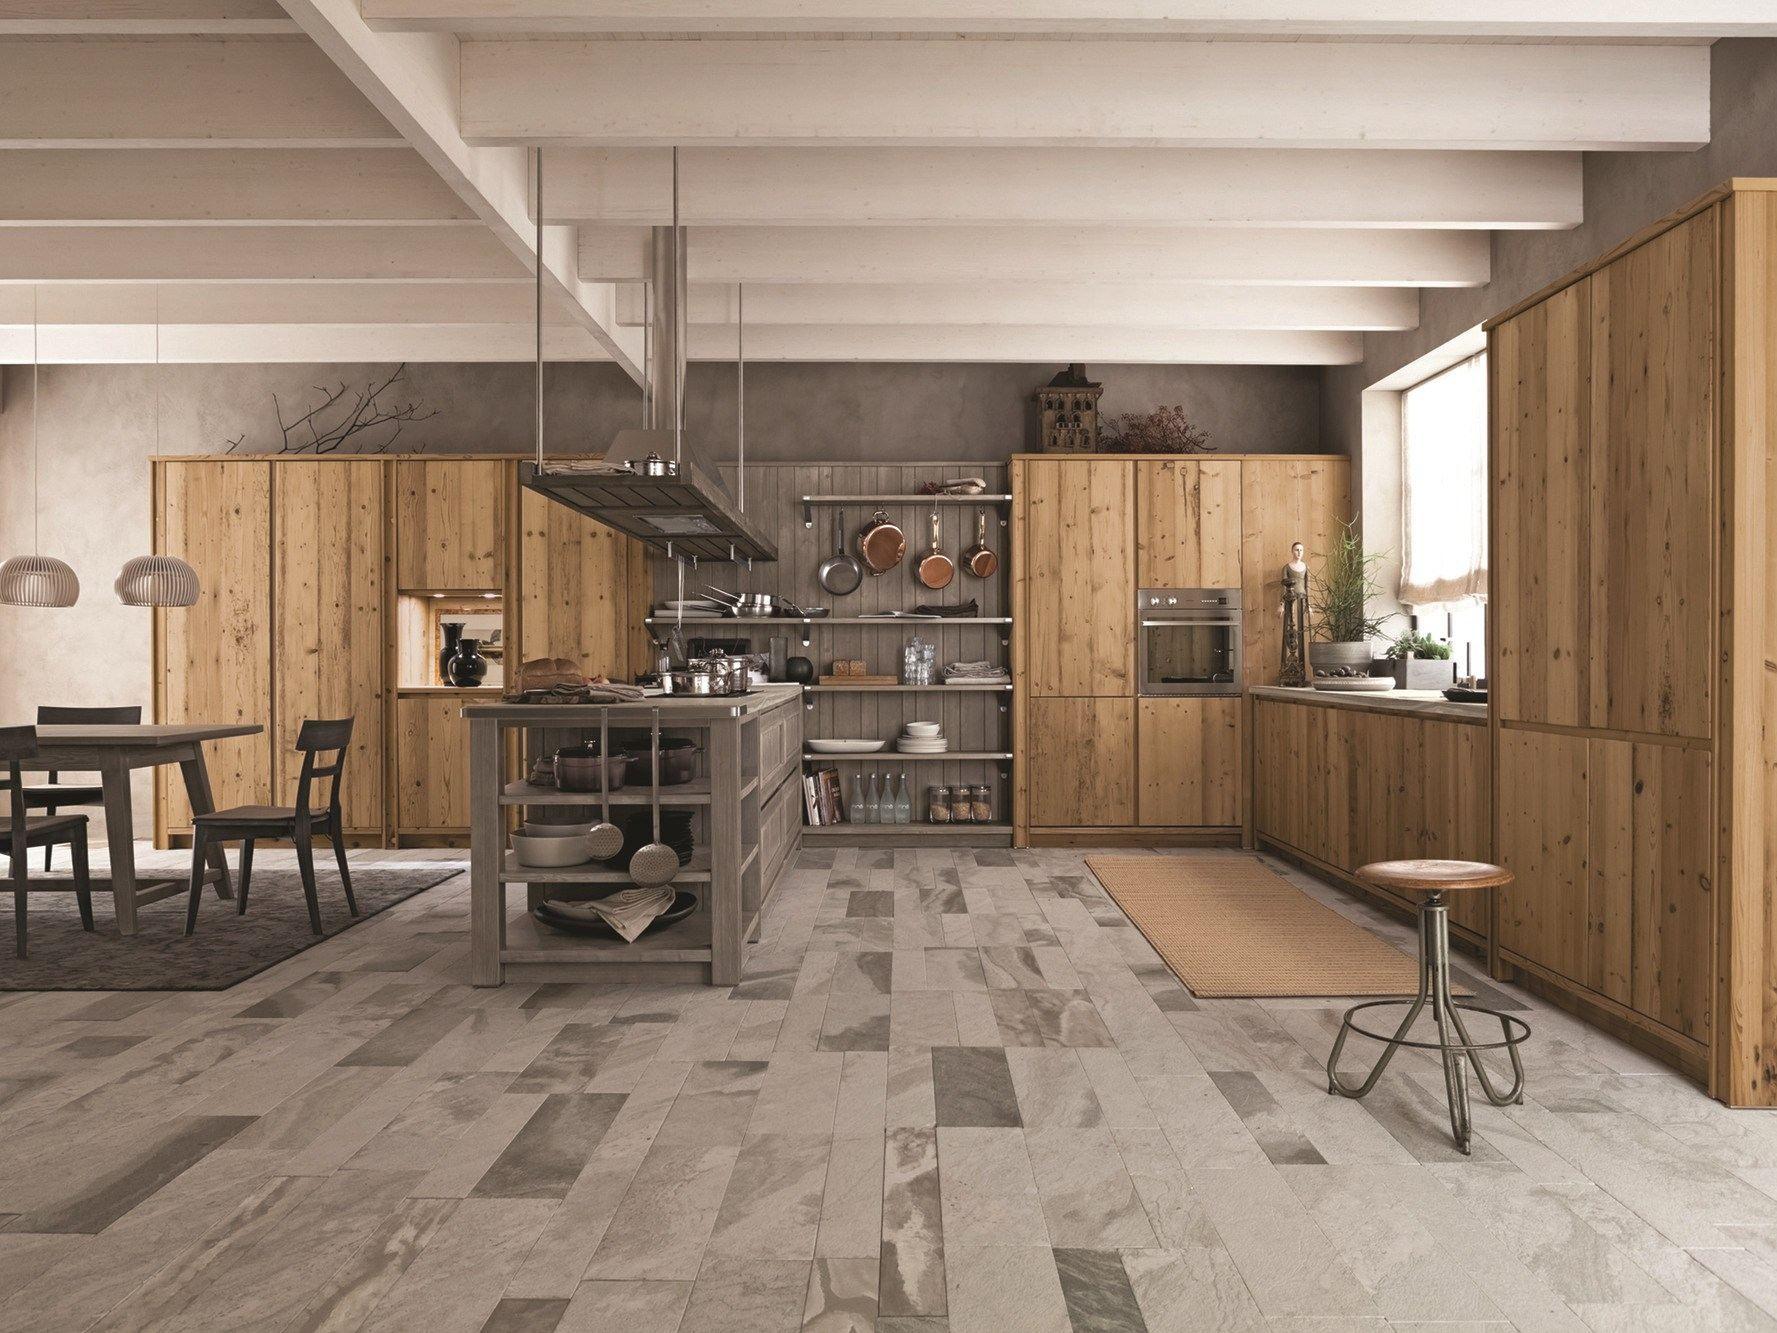 Cucina in abete ardesia con penisola maestrale 03 by - Ardesia in cucina ...